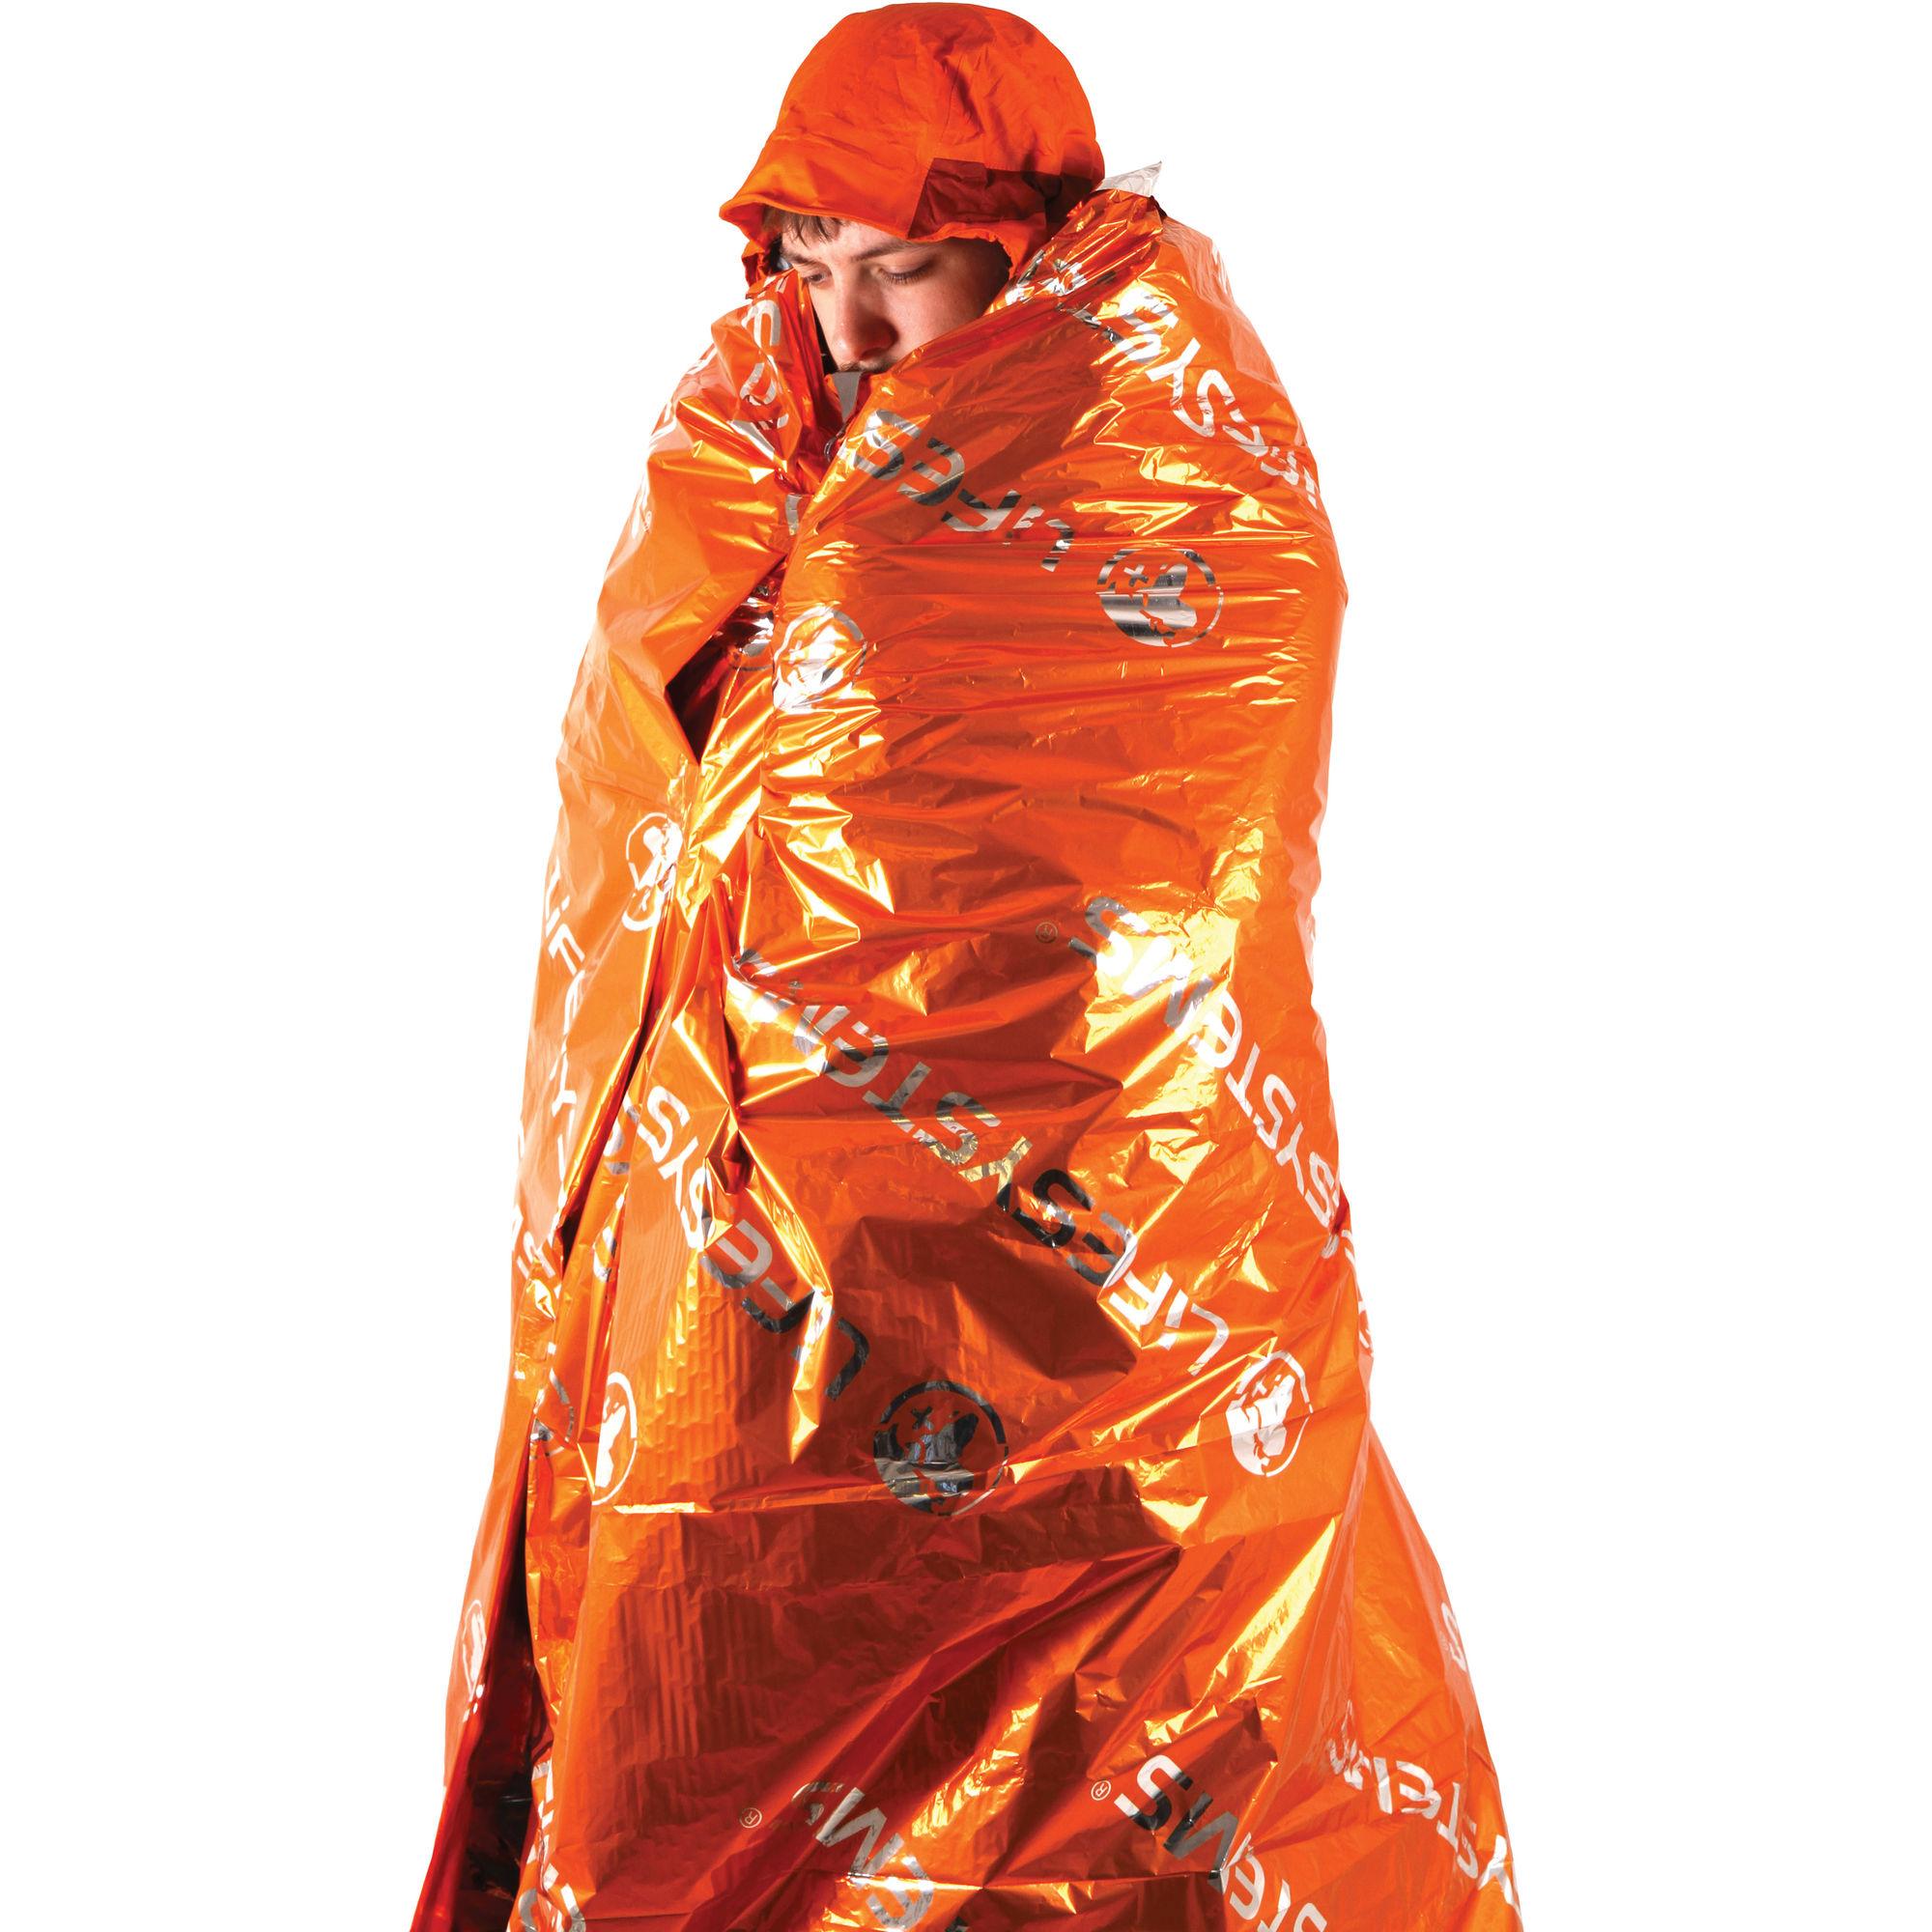 Lifeventure Thermal Blanket TL易尋緊急求生毯-熱反射 lifesystems 42120